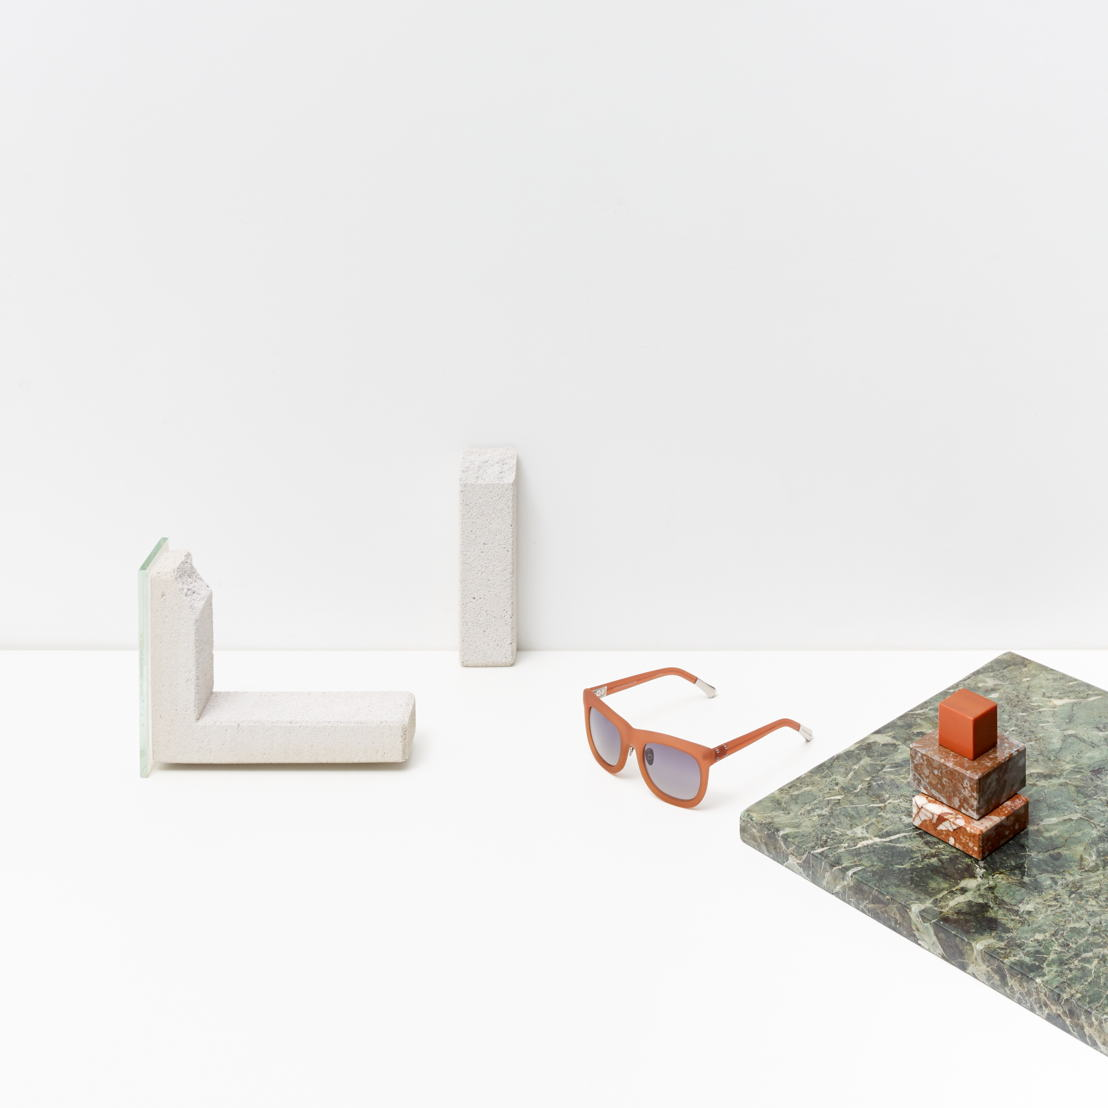 Kris Van Assche - Rubberised orange acetate frame teamed with a grey gradient lens